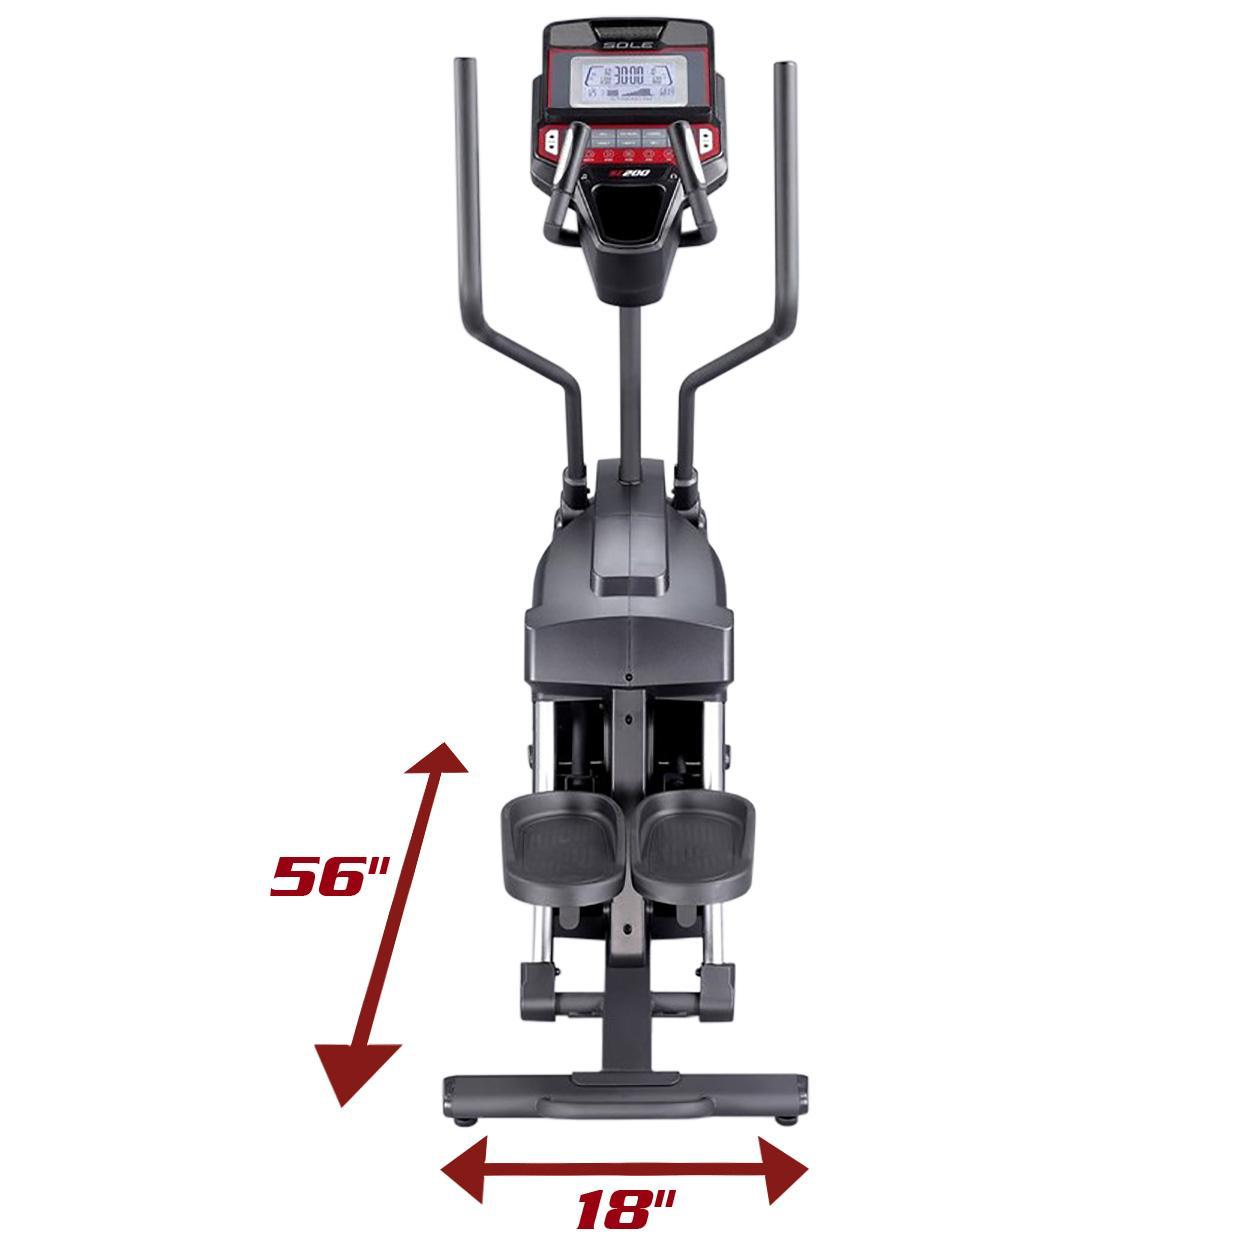 Sole Fitness Sc200 Elliptical Stepper Elliptical Stepper